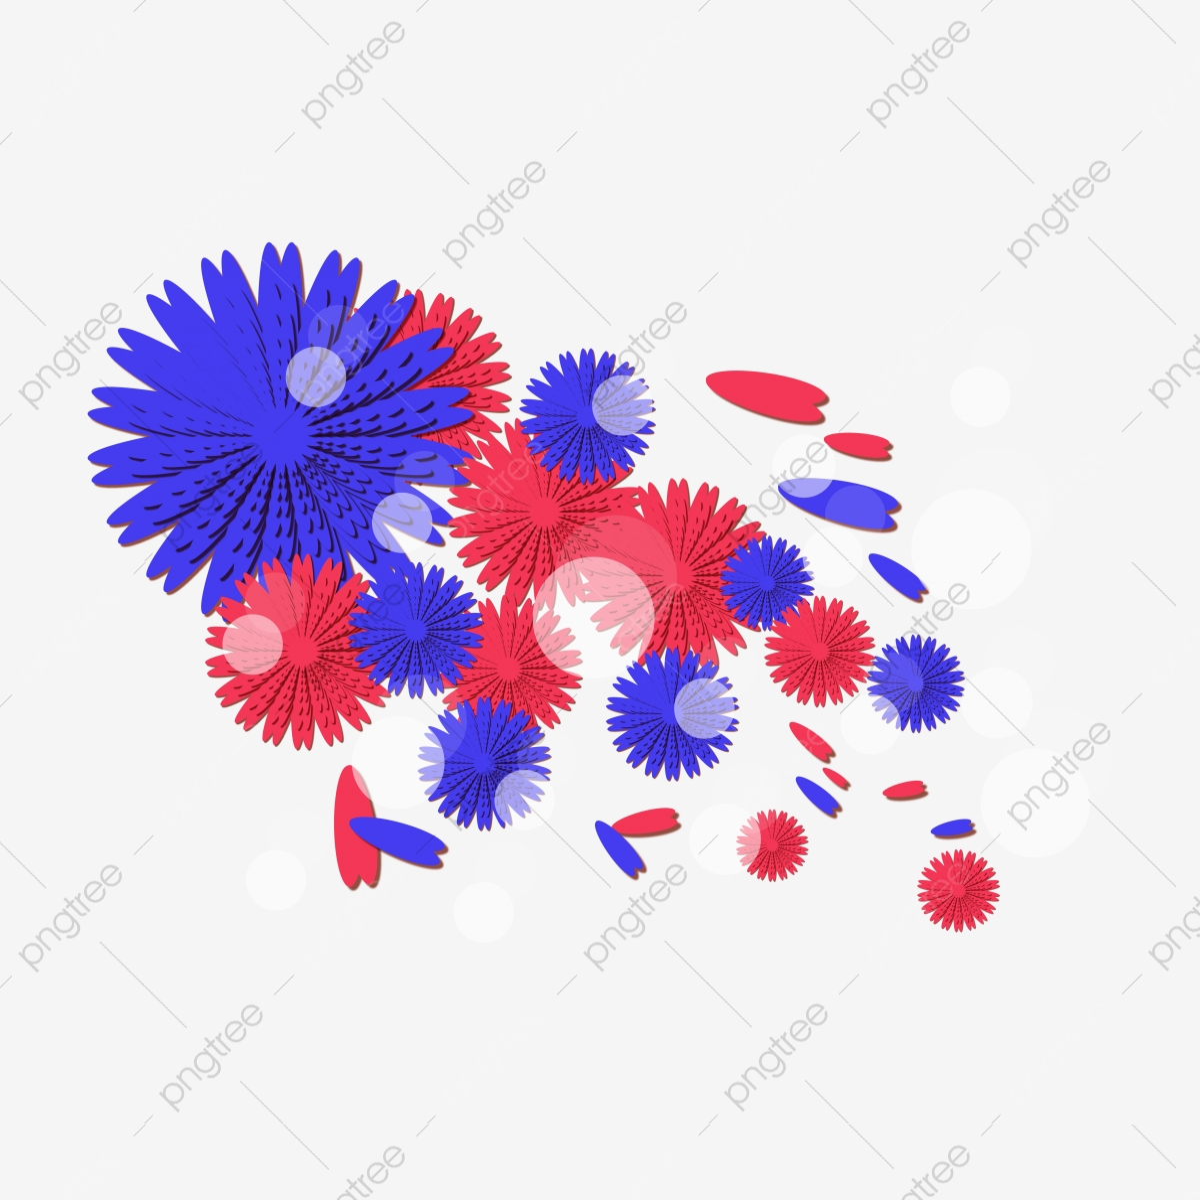 Tangan Ditarik Biru Kecerunan Bunga Jepun Kartun Rotten Png Dan